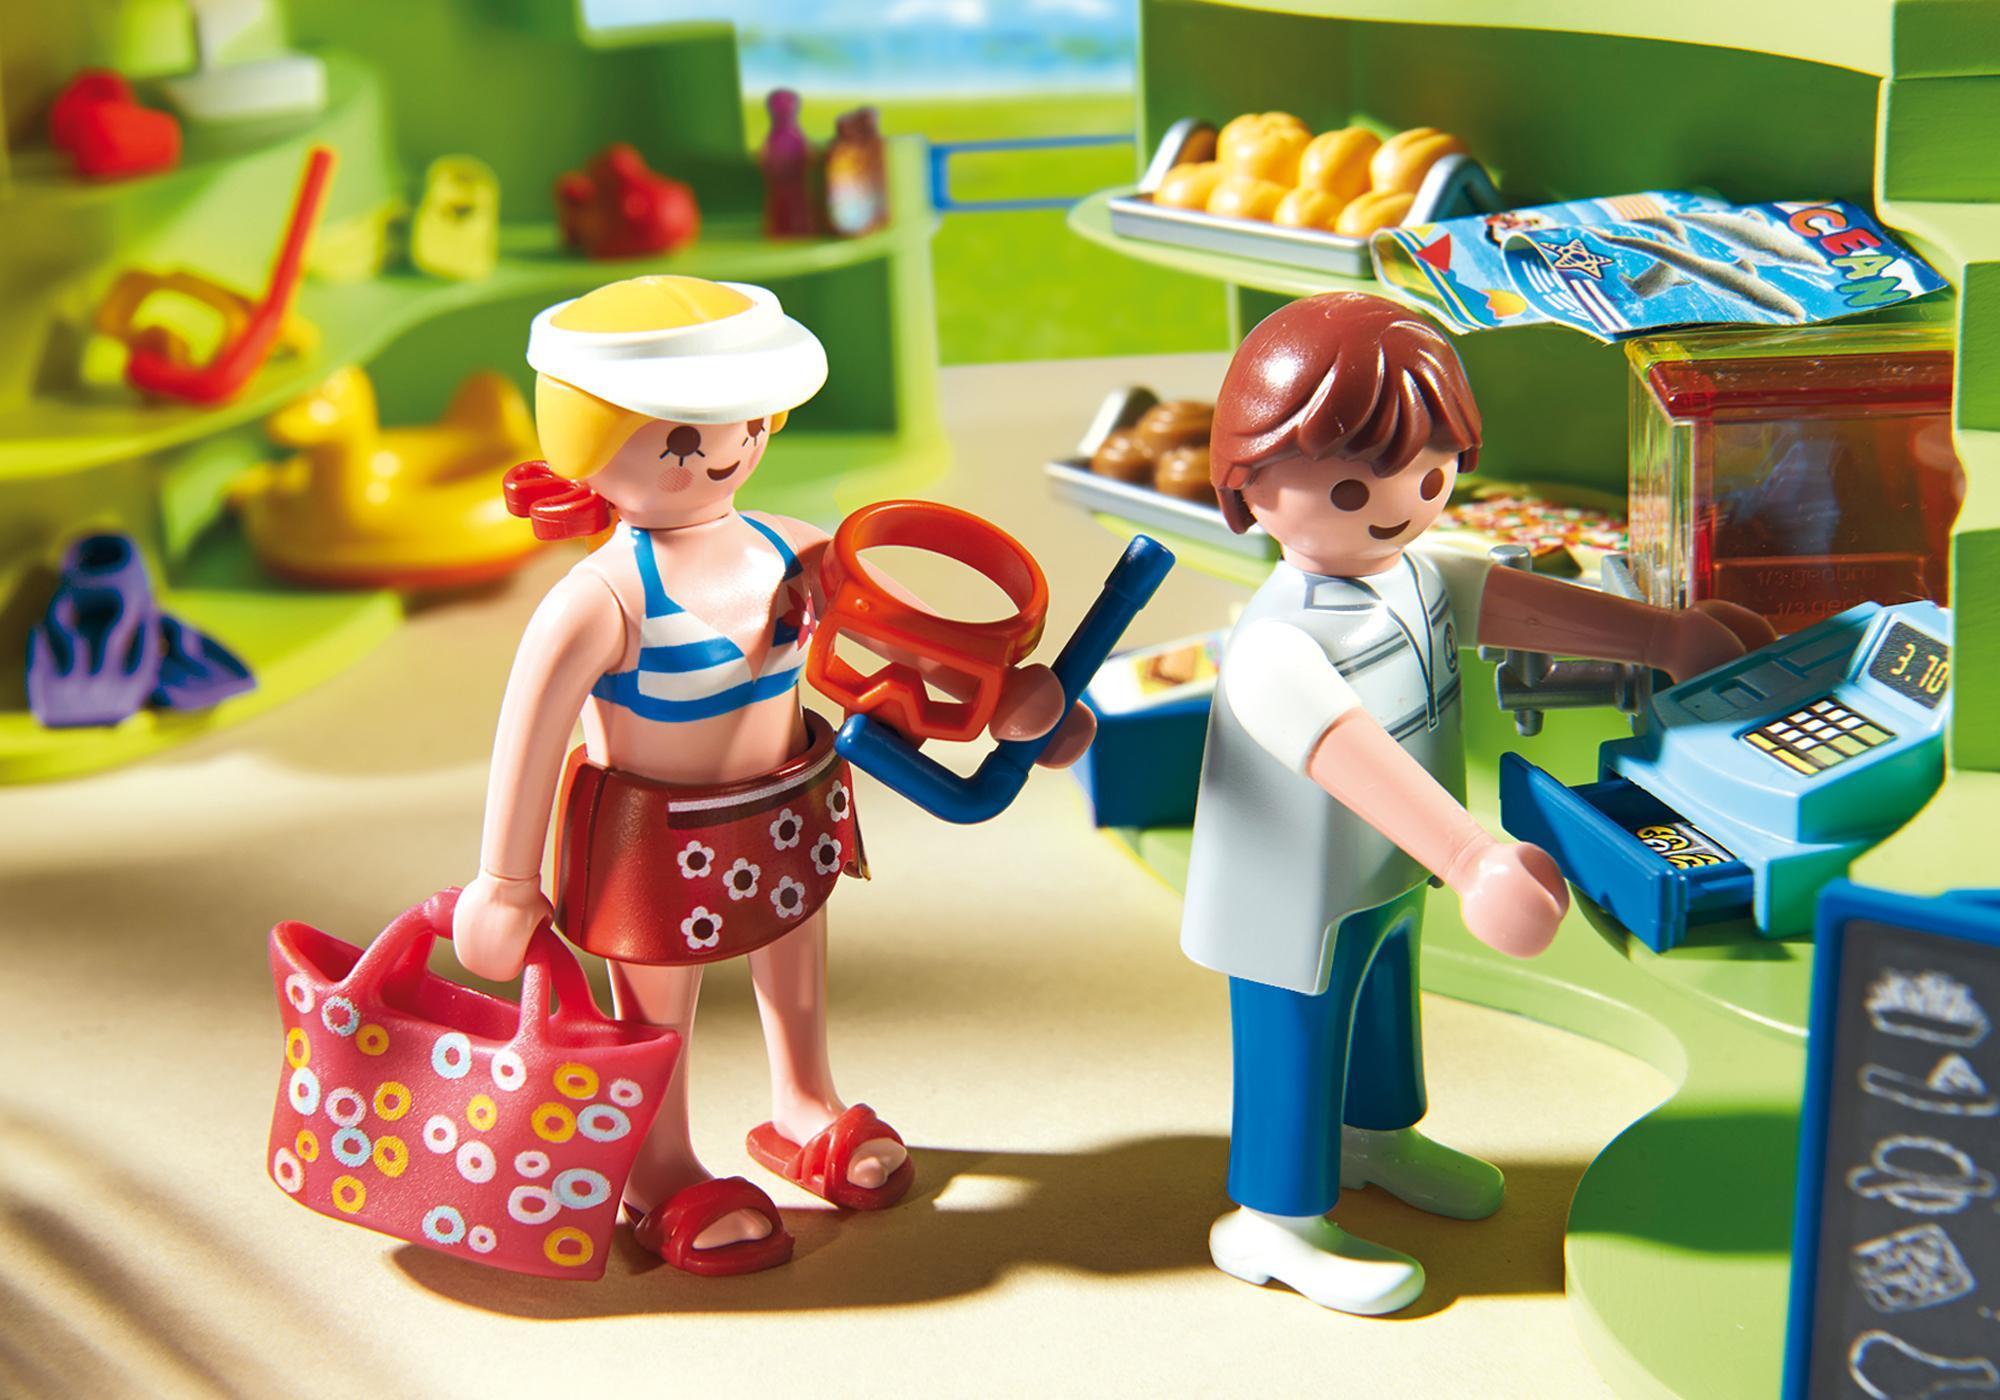 http://media.playmobil.com/i/playmobil/6672_product_extra1/Shop mit Imbiss